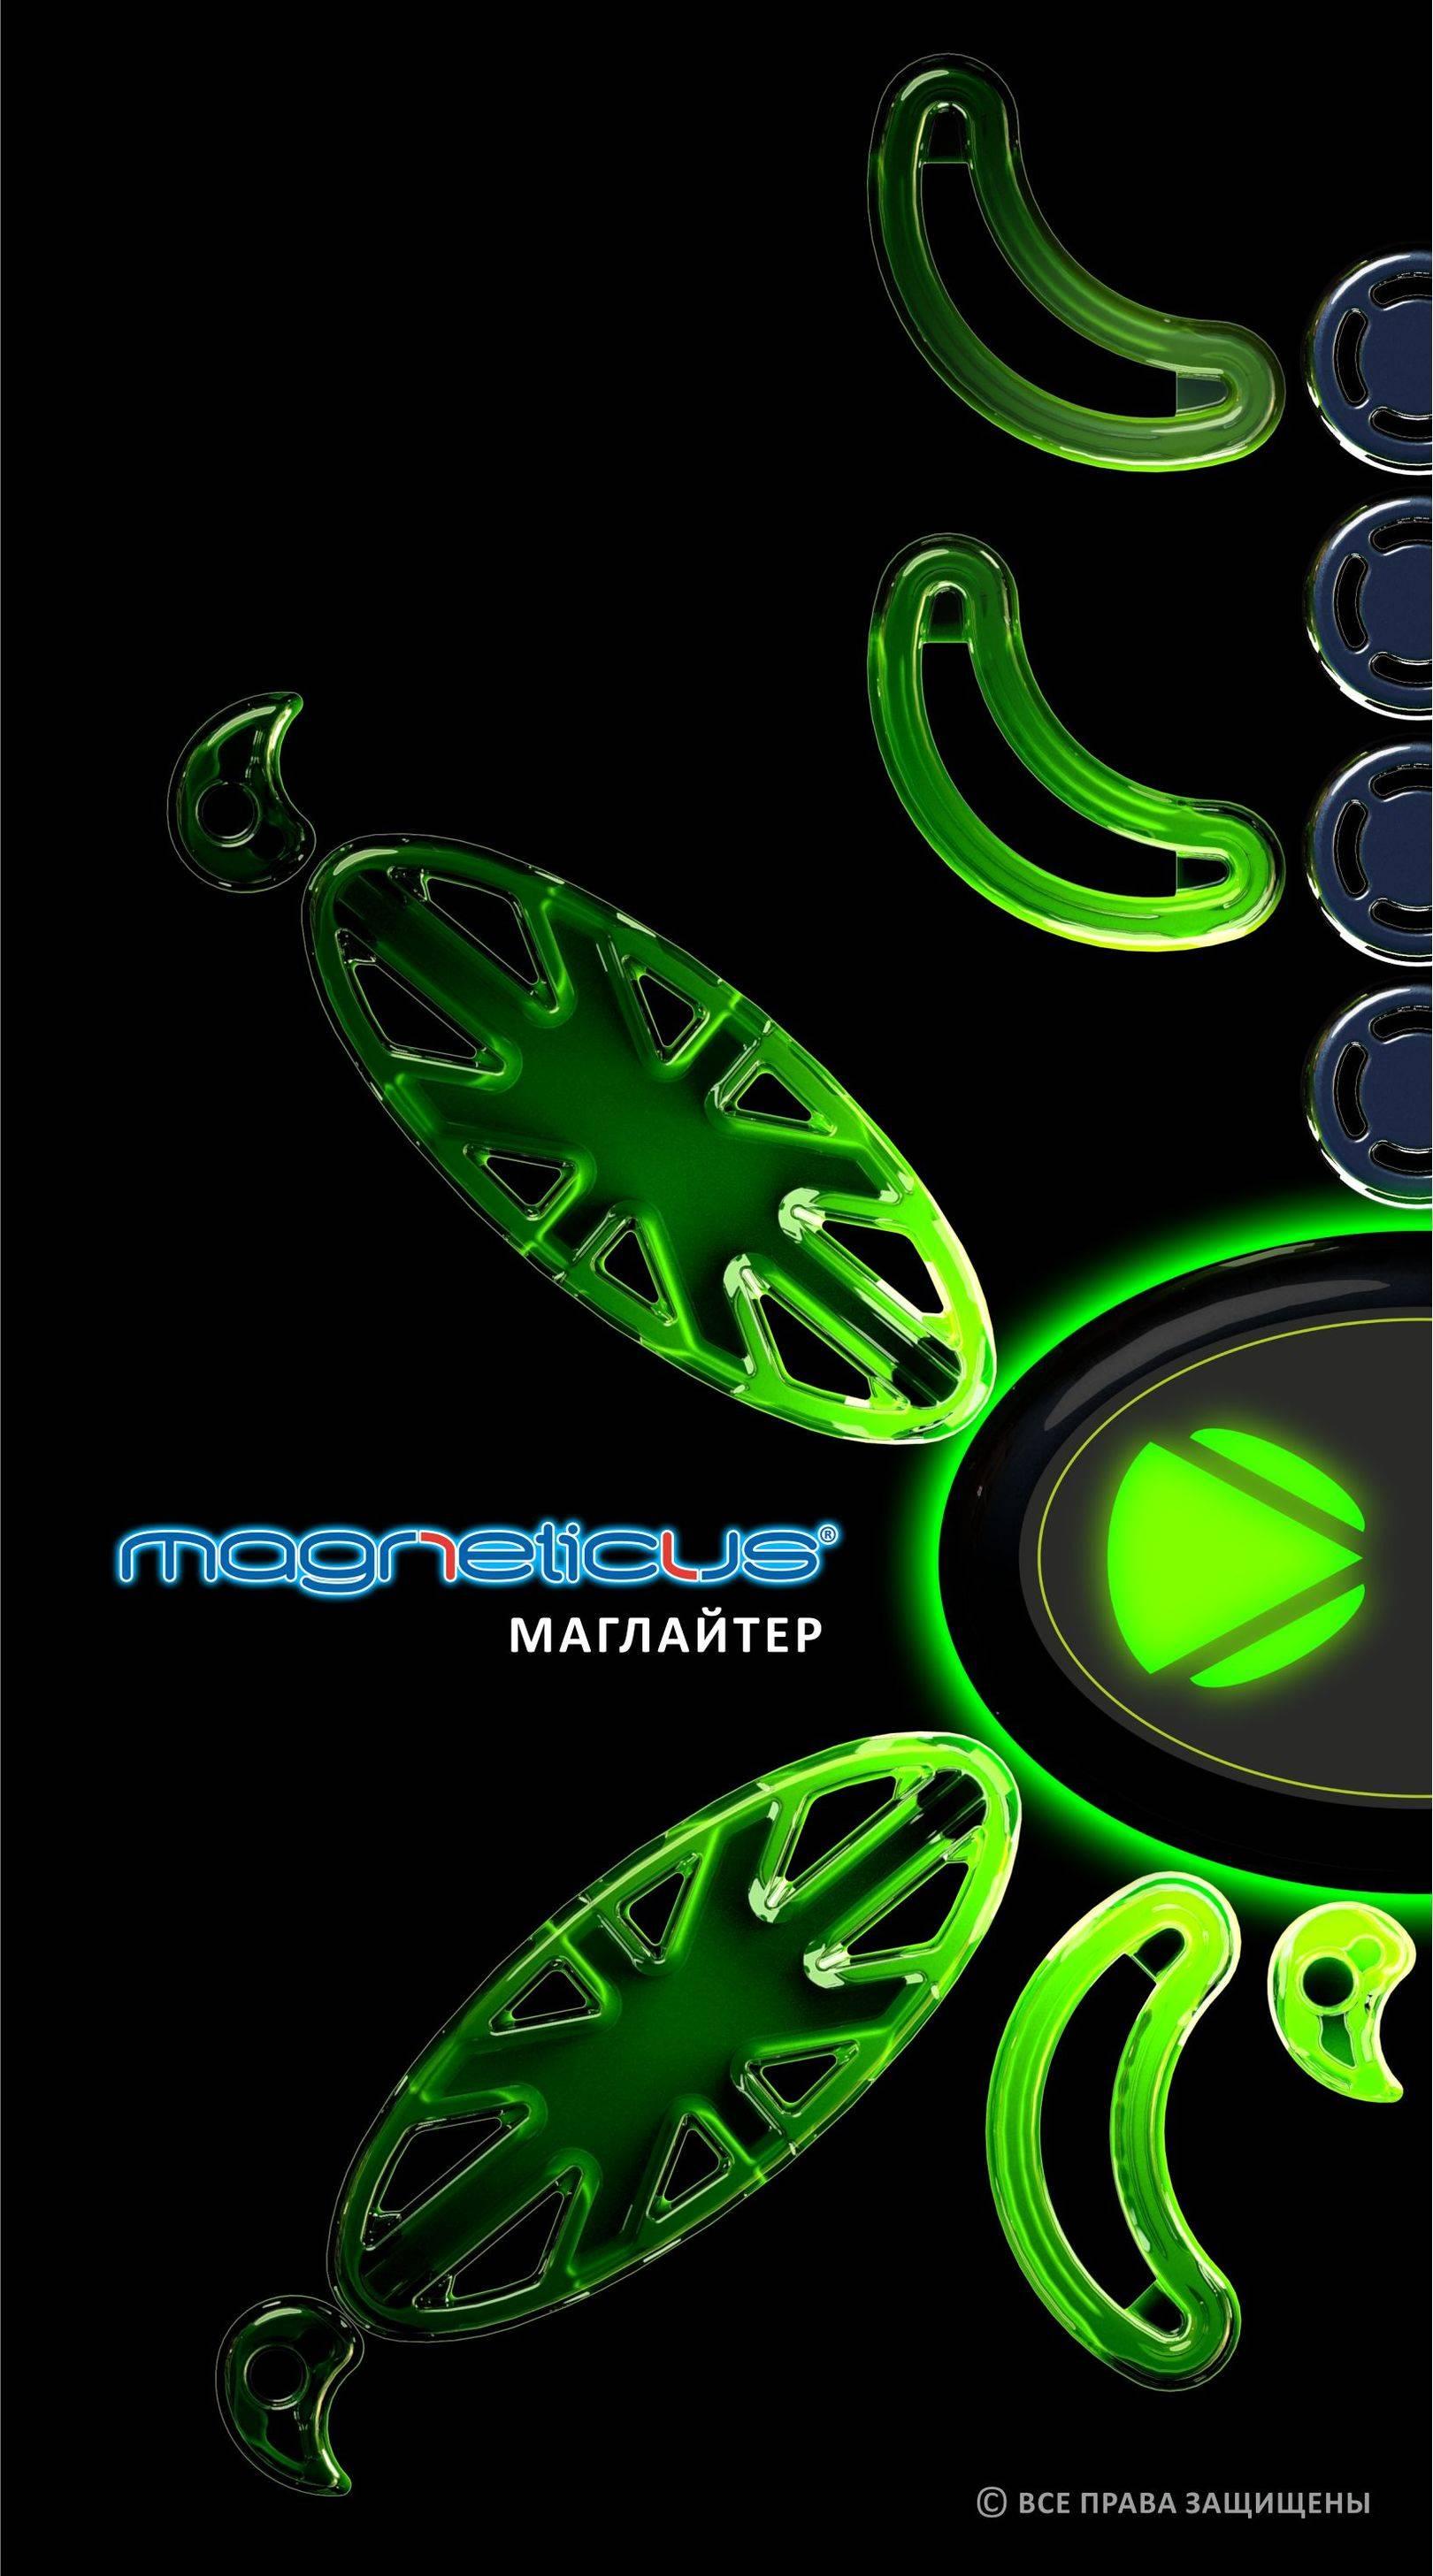 Маглайтер magneticus